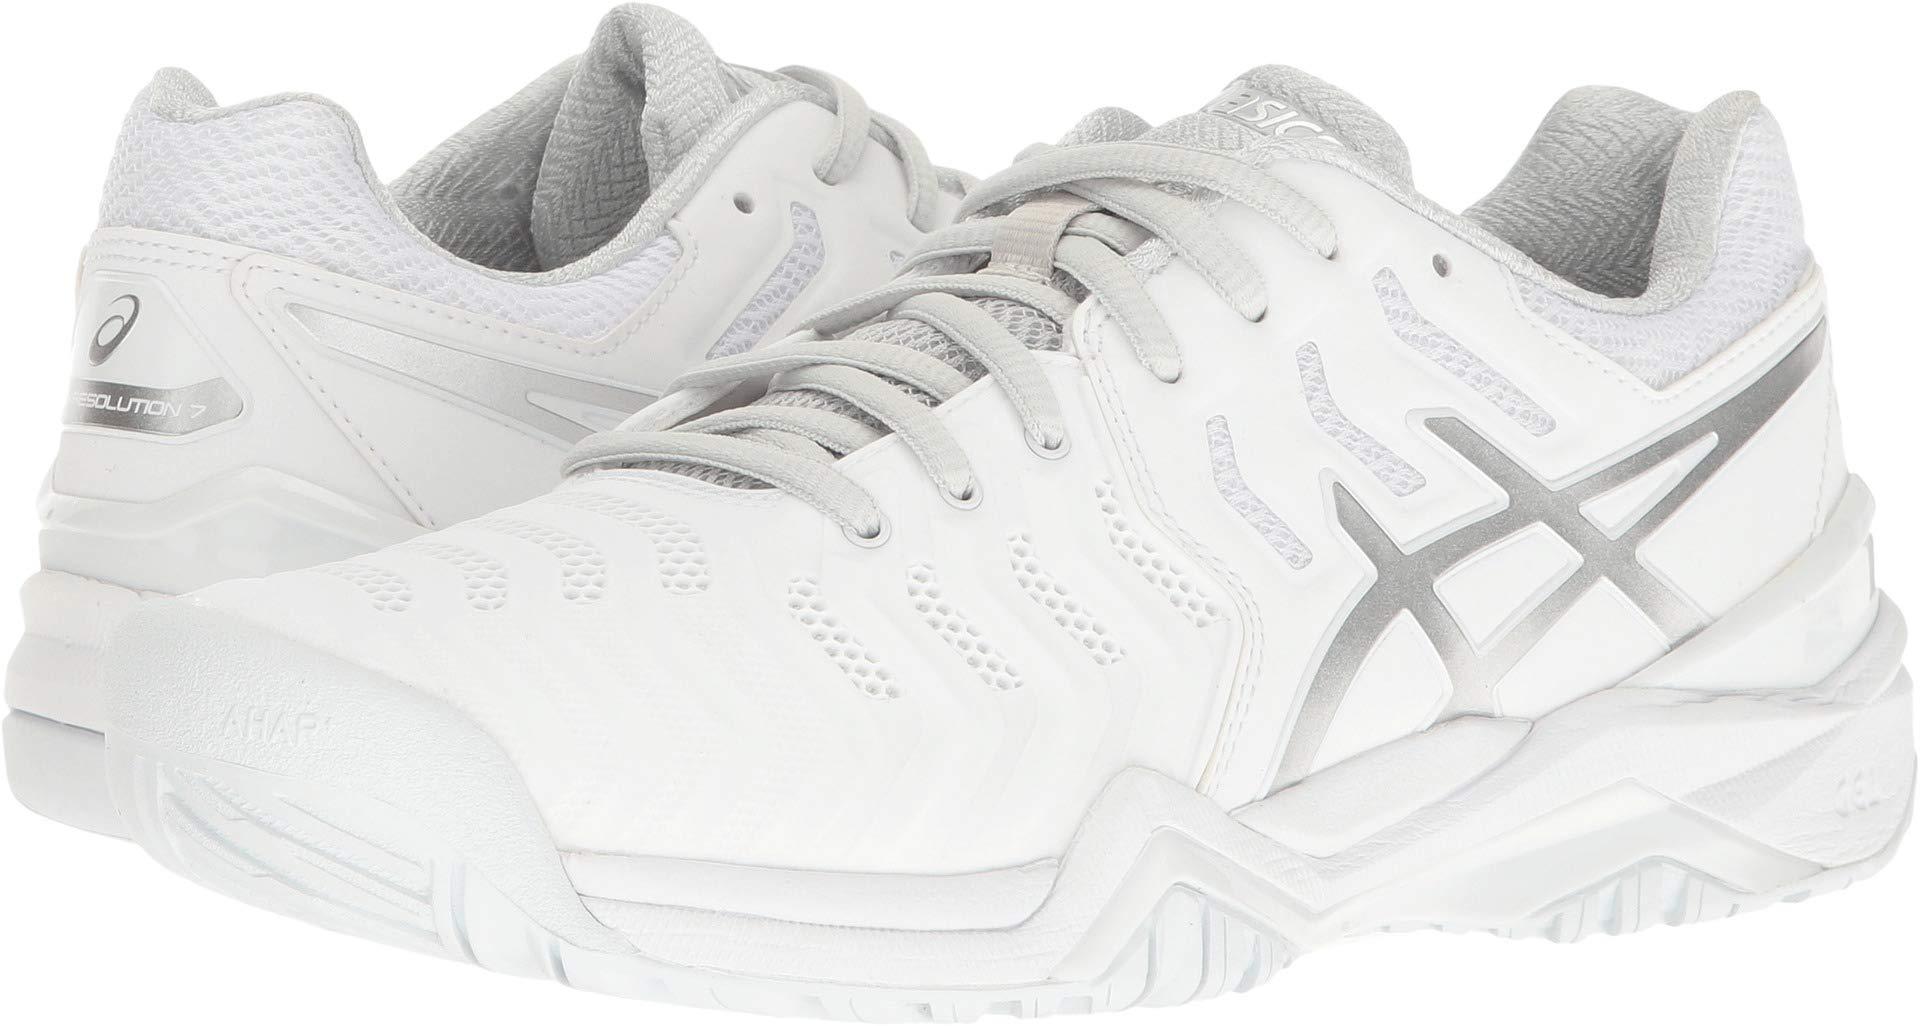 ASICS Women's Gel-Resolution 7 Tennis Shoe, White/Silver, 8.5 M US by ASICS